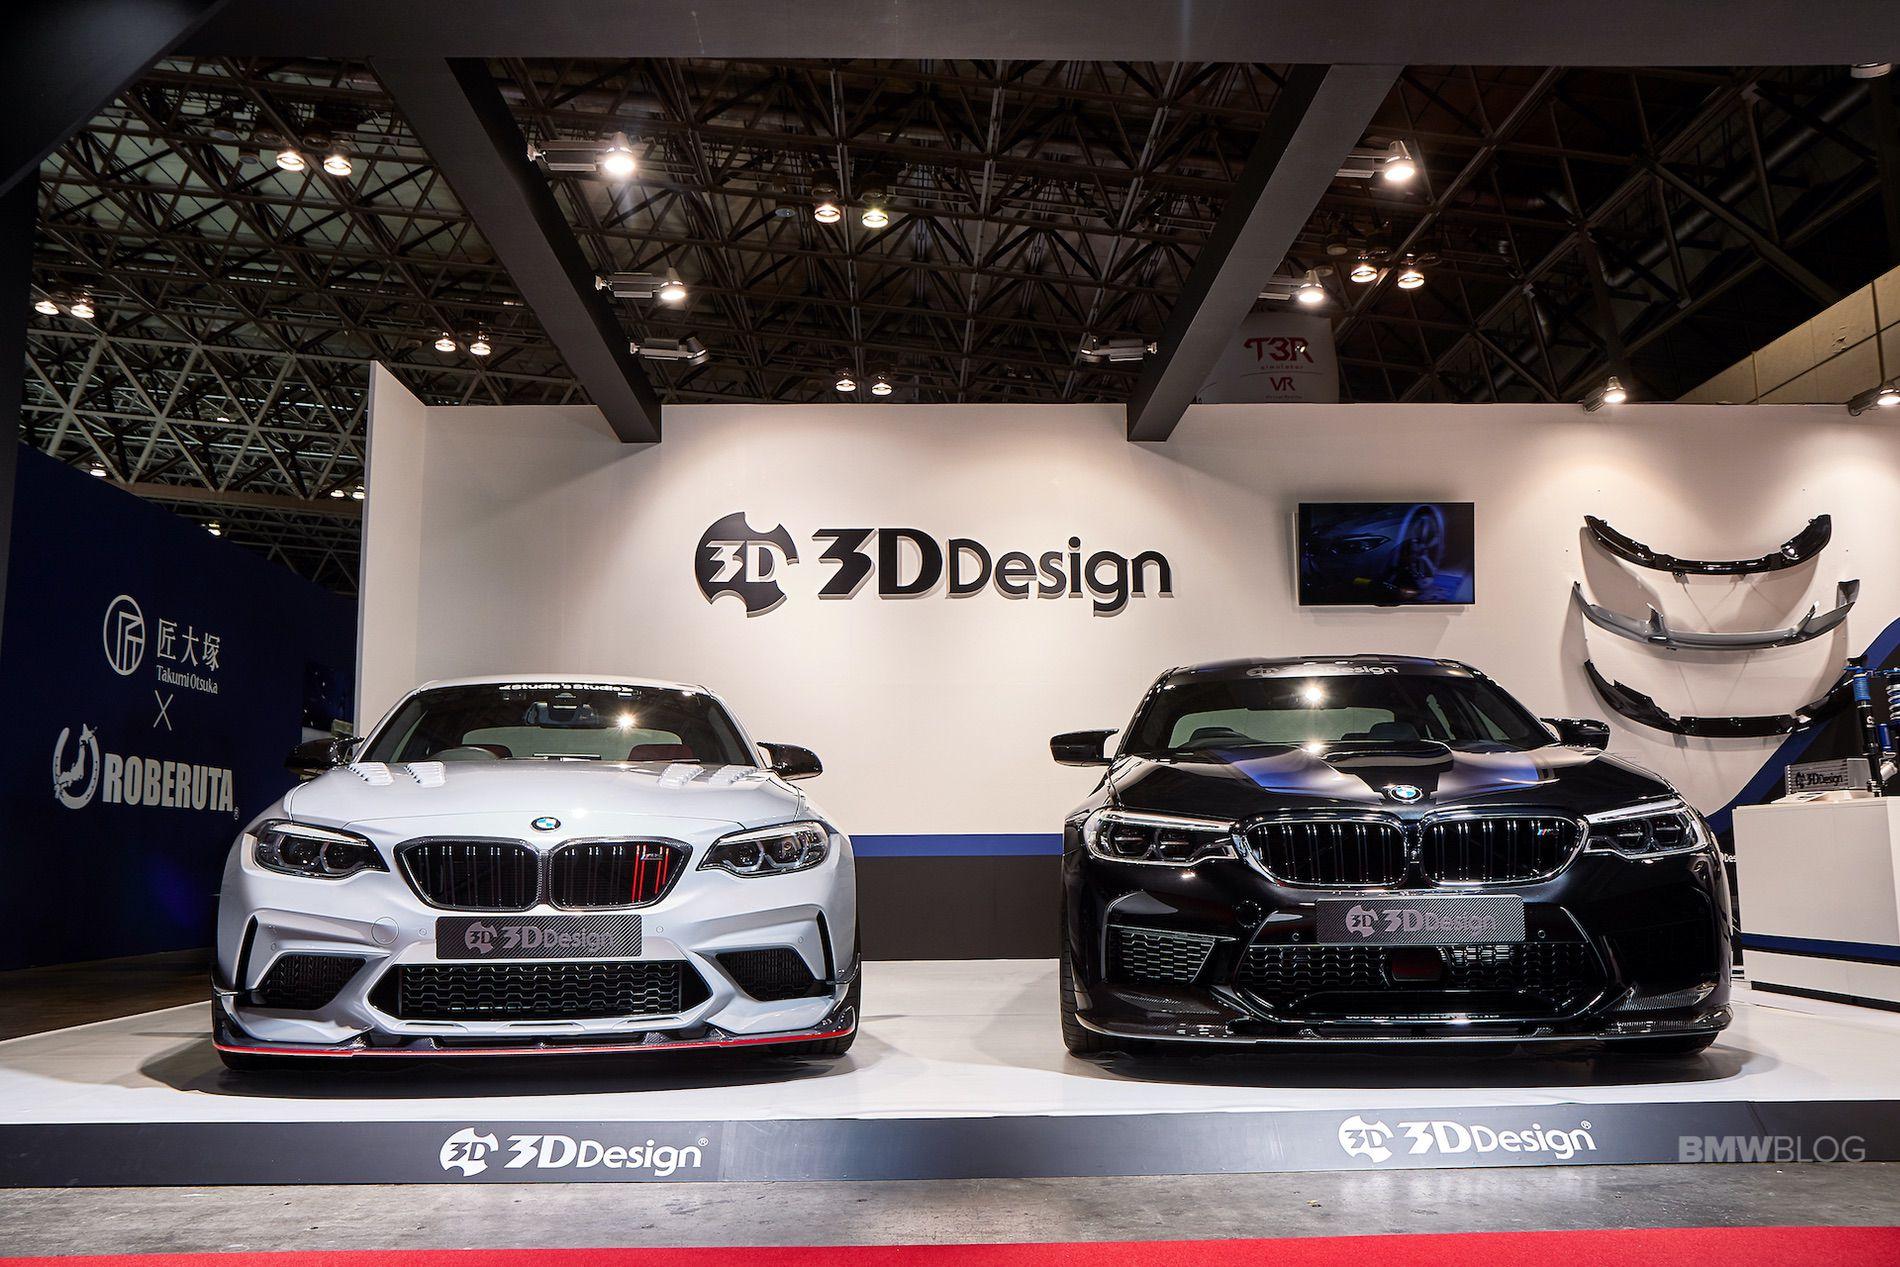 3D Design F90 BMW M5 01